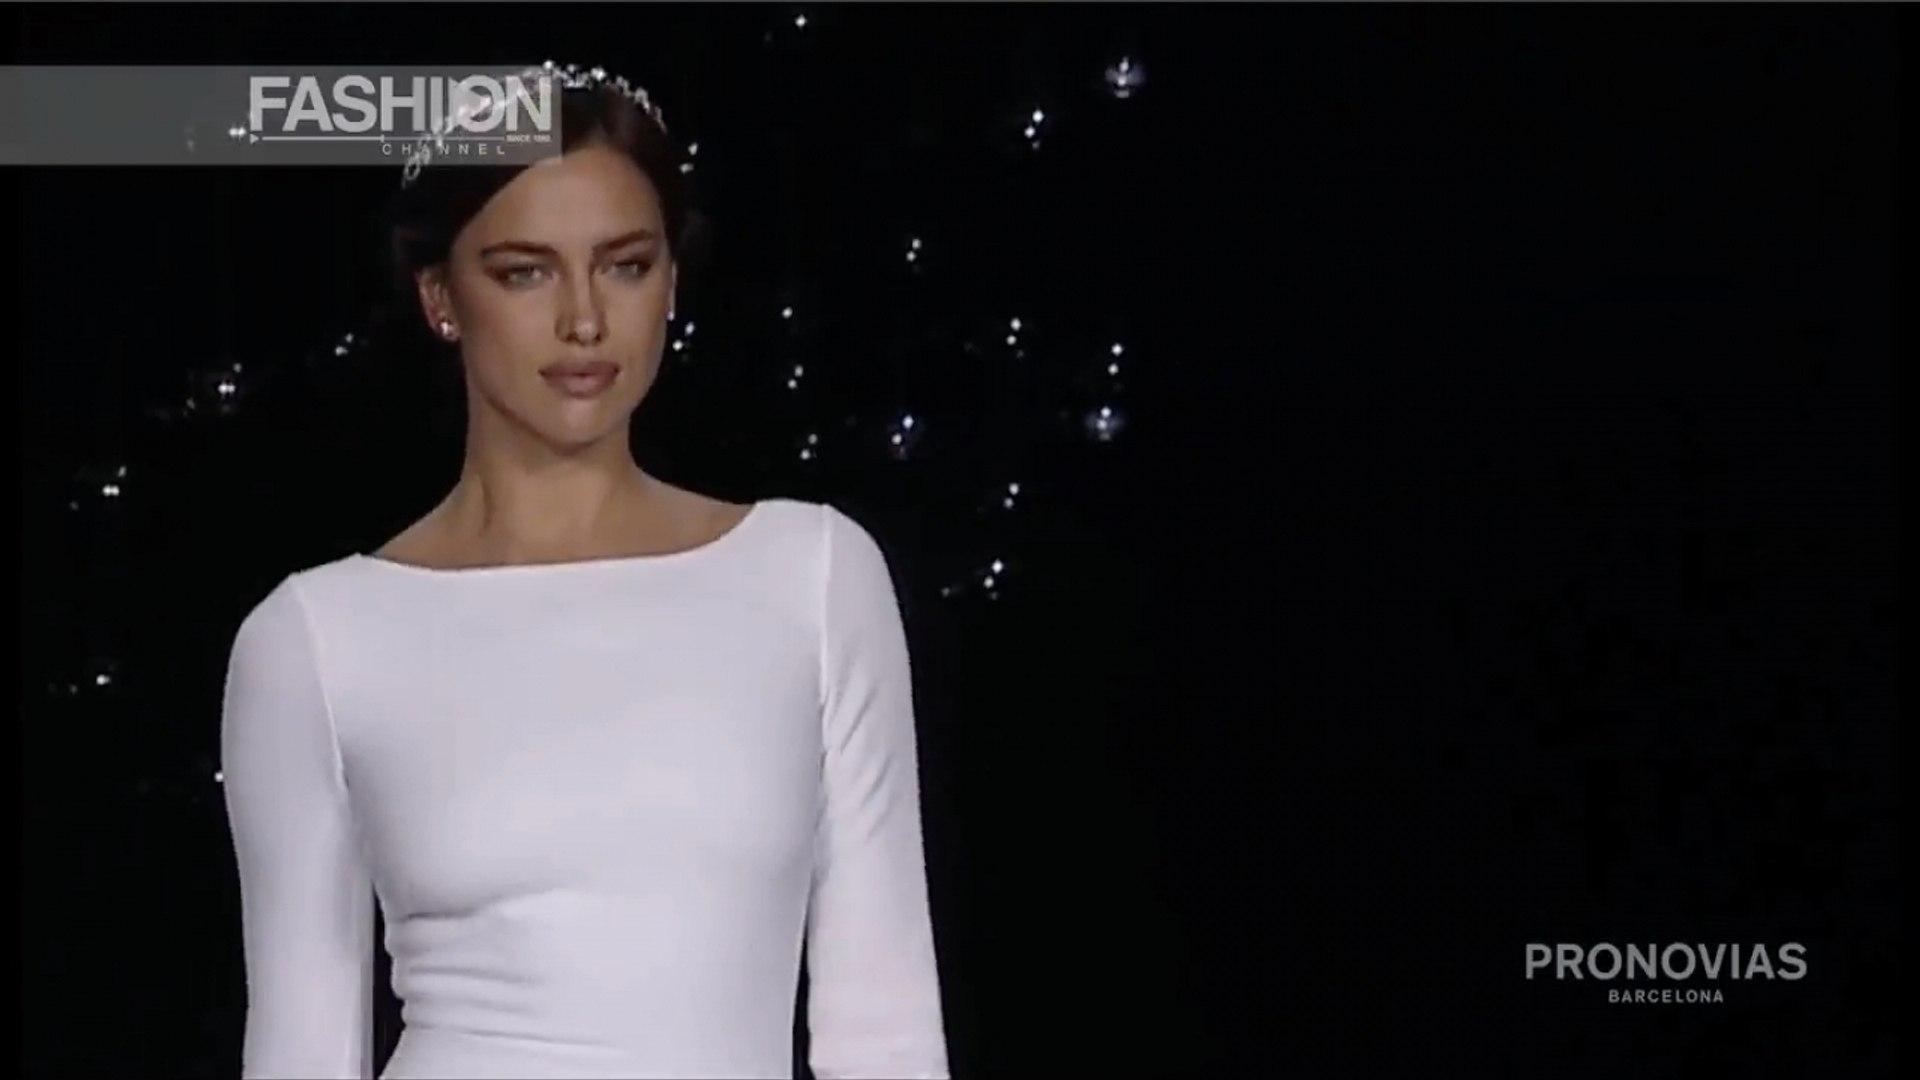 PRONOVIAS Bridal Fashion Show 2016 Barcelona by Fashion Channel